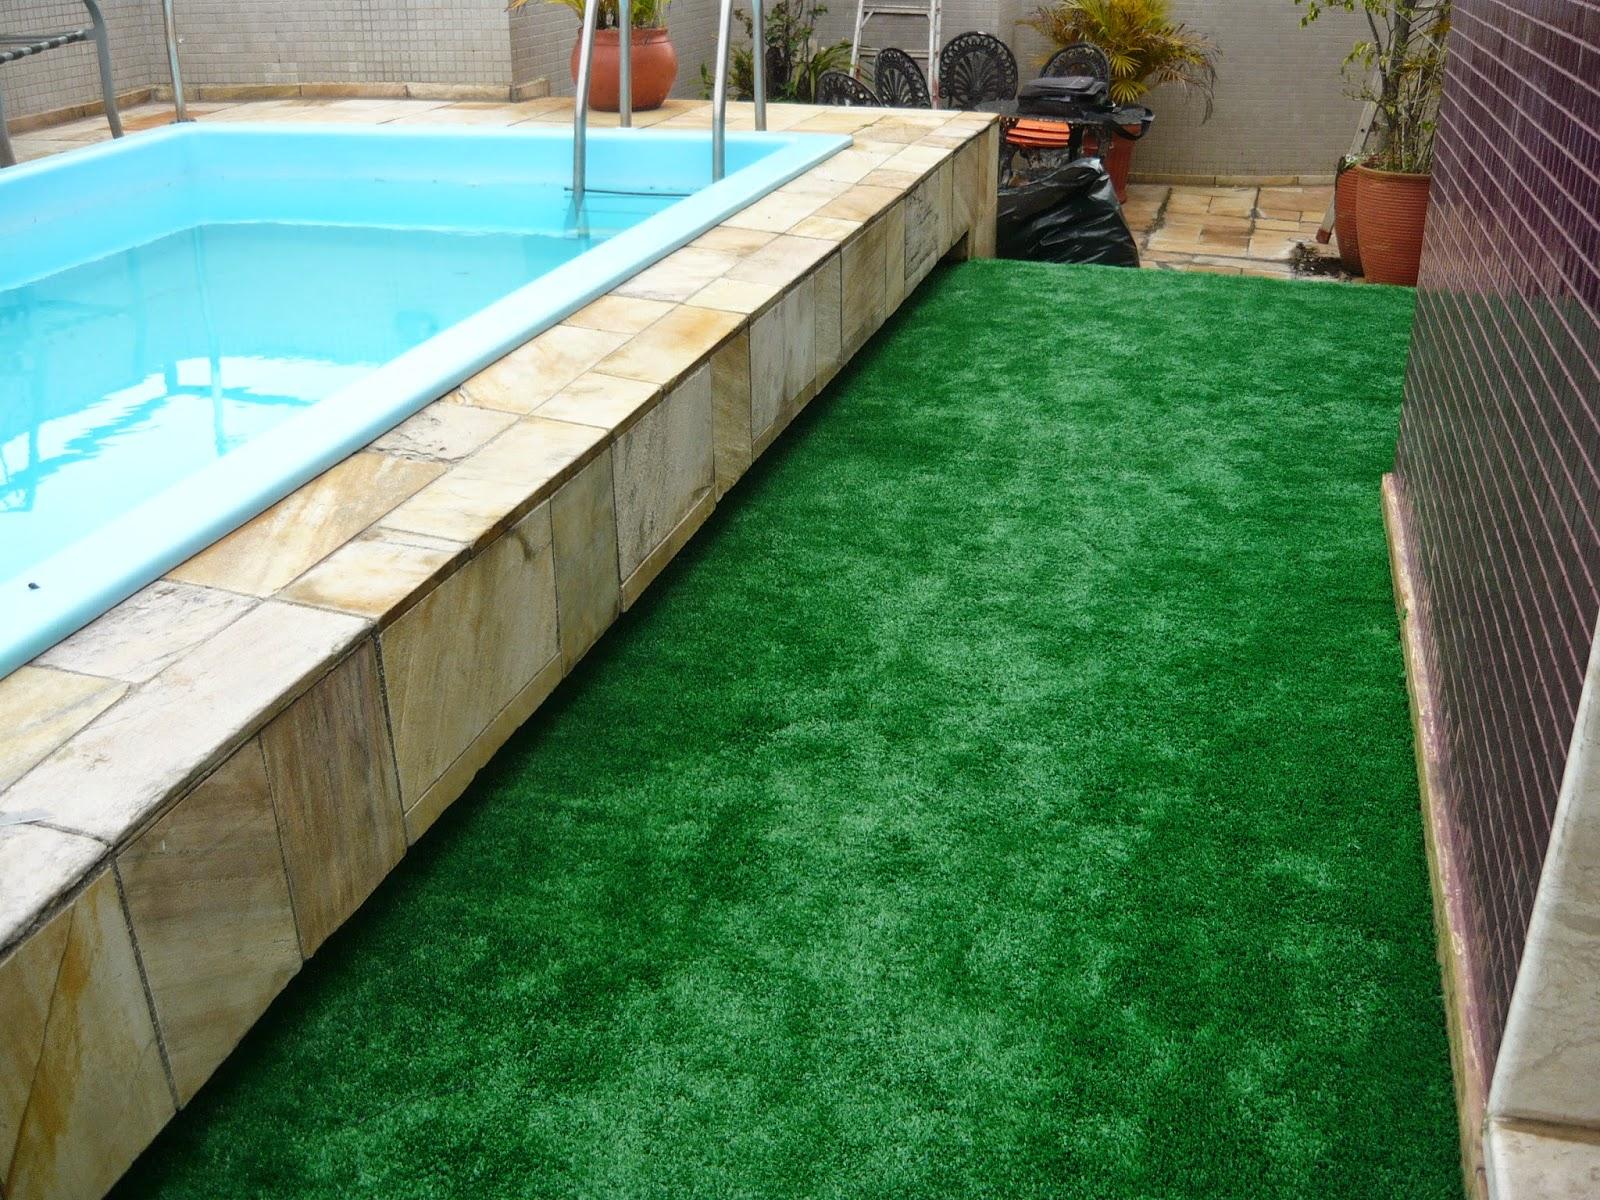 grama sintetica para jardim em curitiba:Grama Sintética Supergrass – Gramados Sinteticos: Grama Sintética